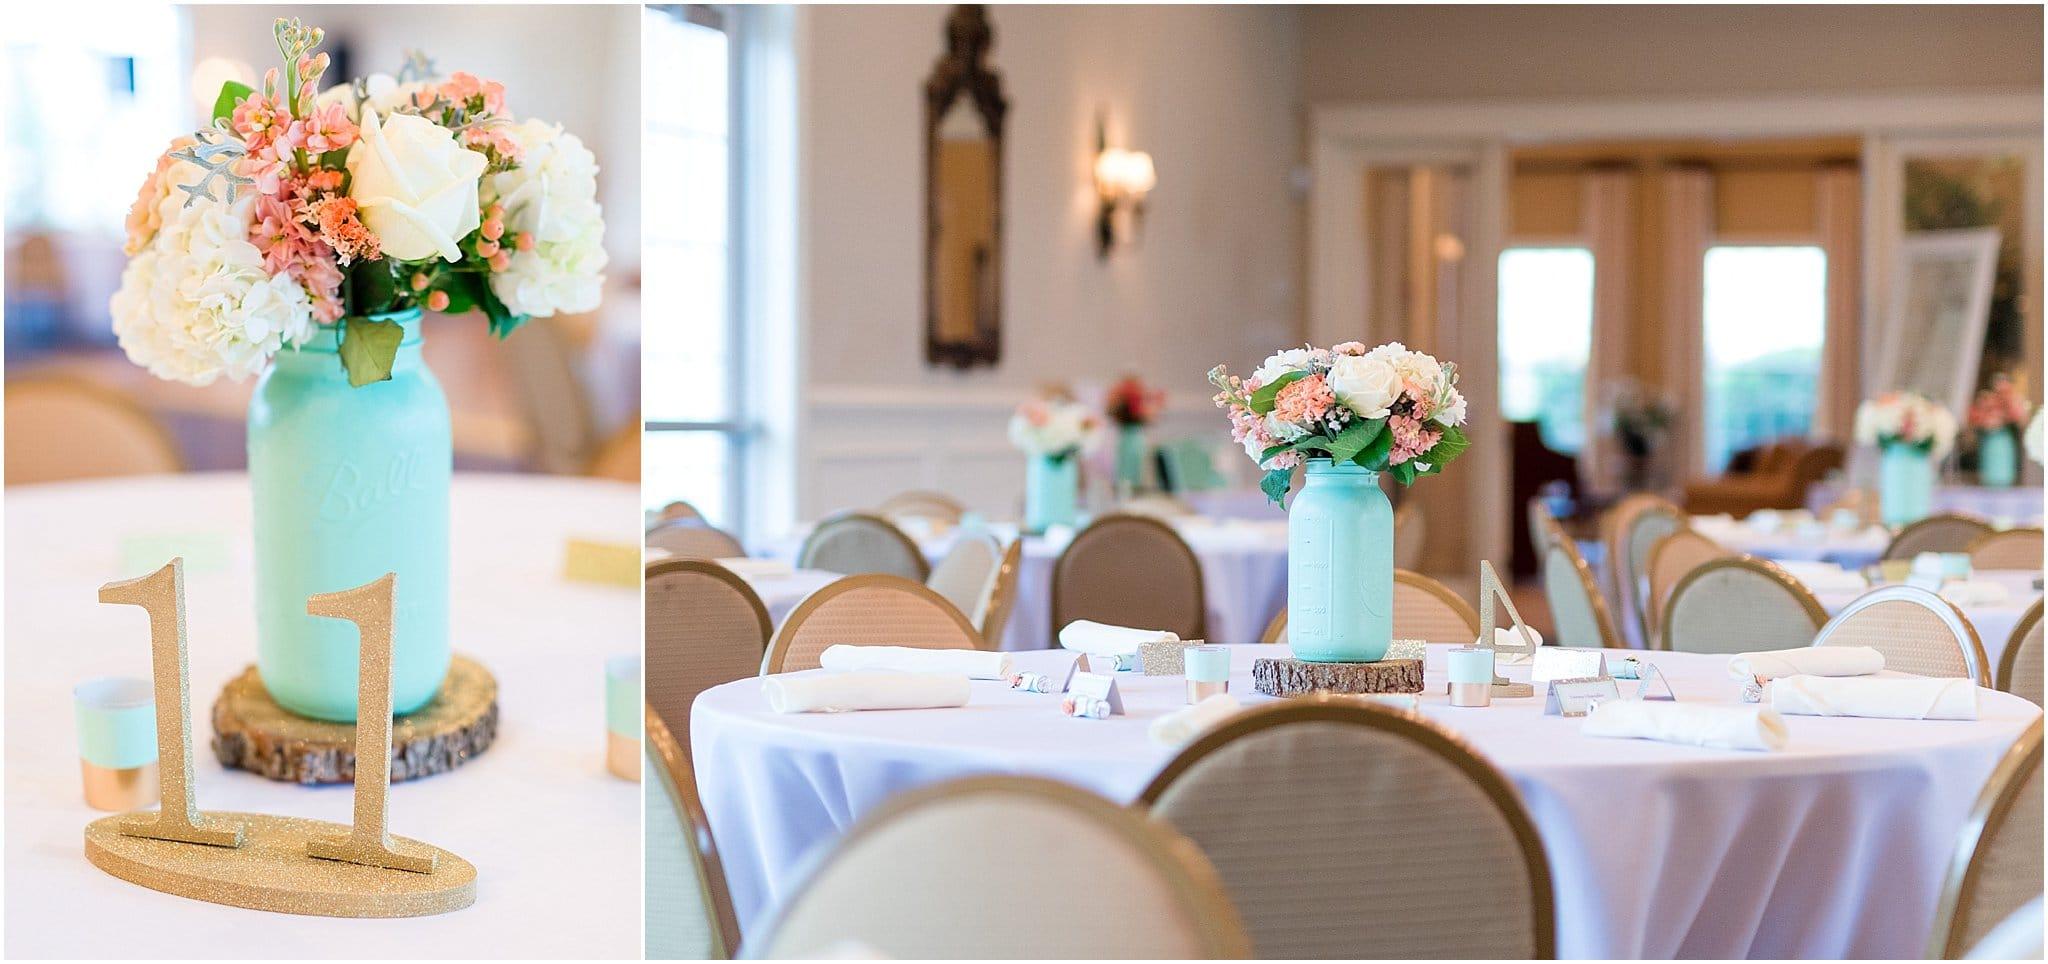 jessscott-milsboro-delaware-wedding-cassidymrphotography_0041